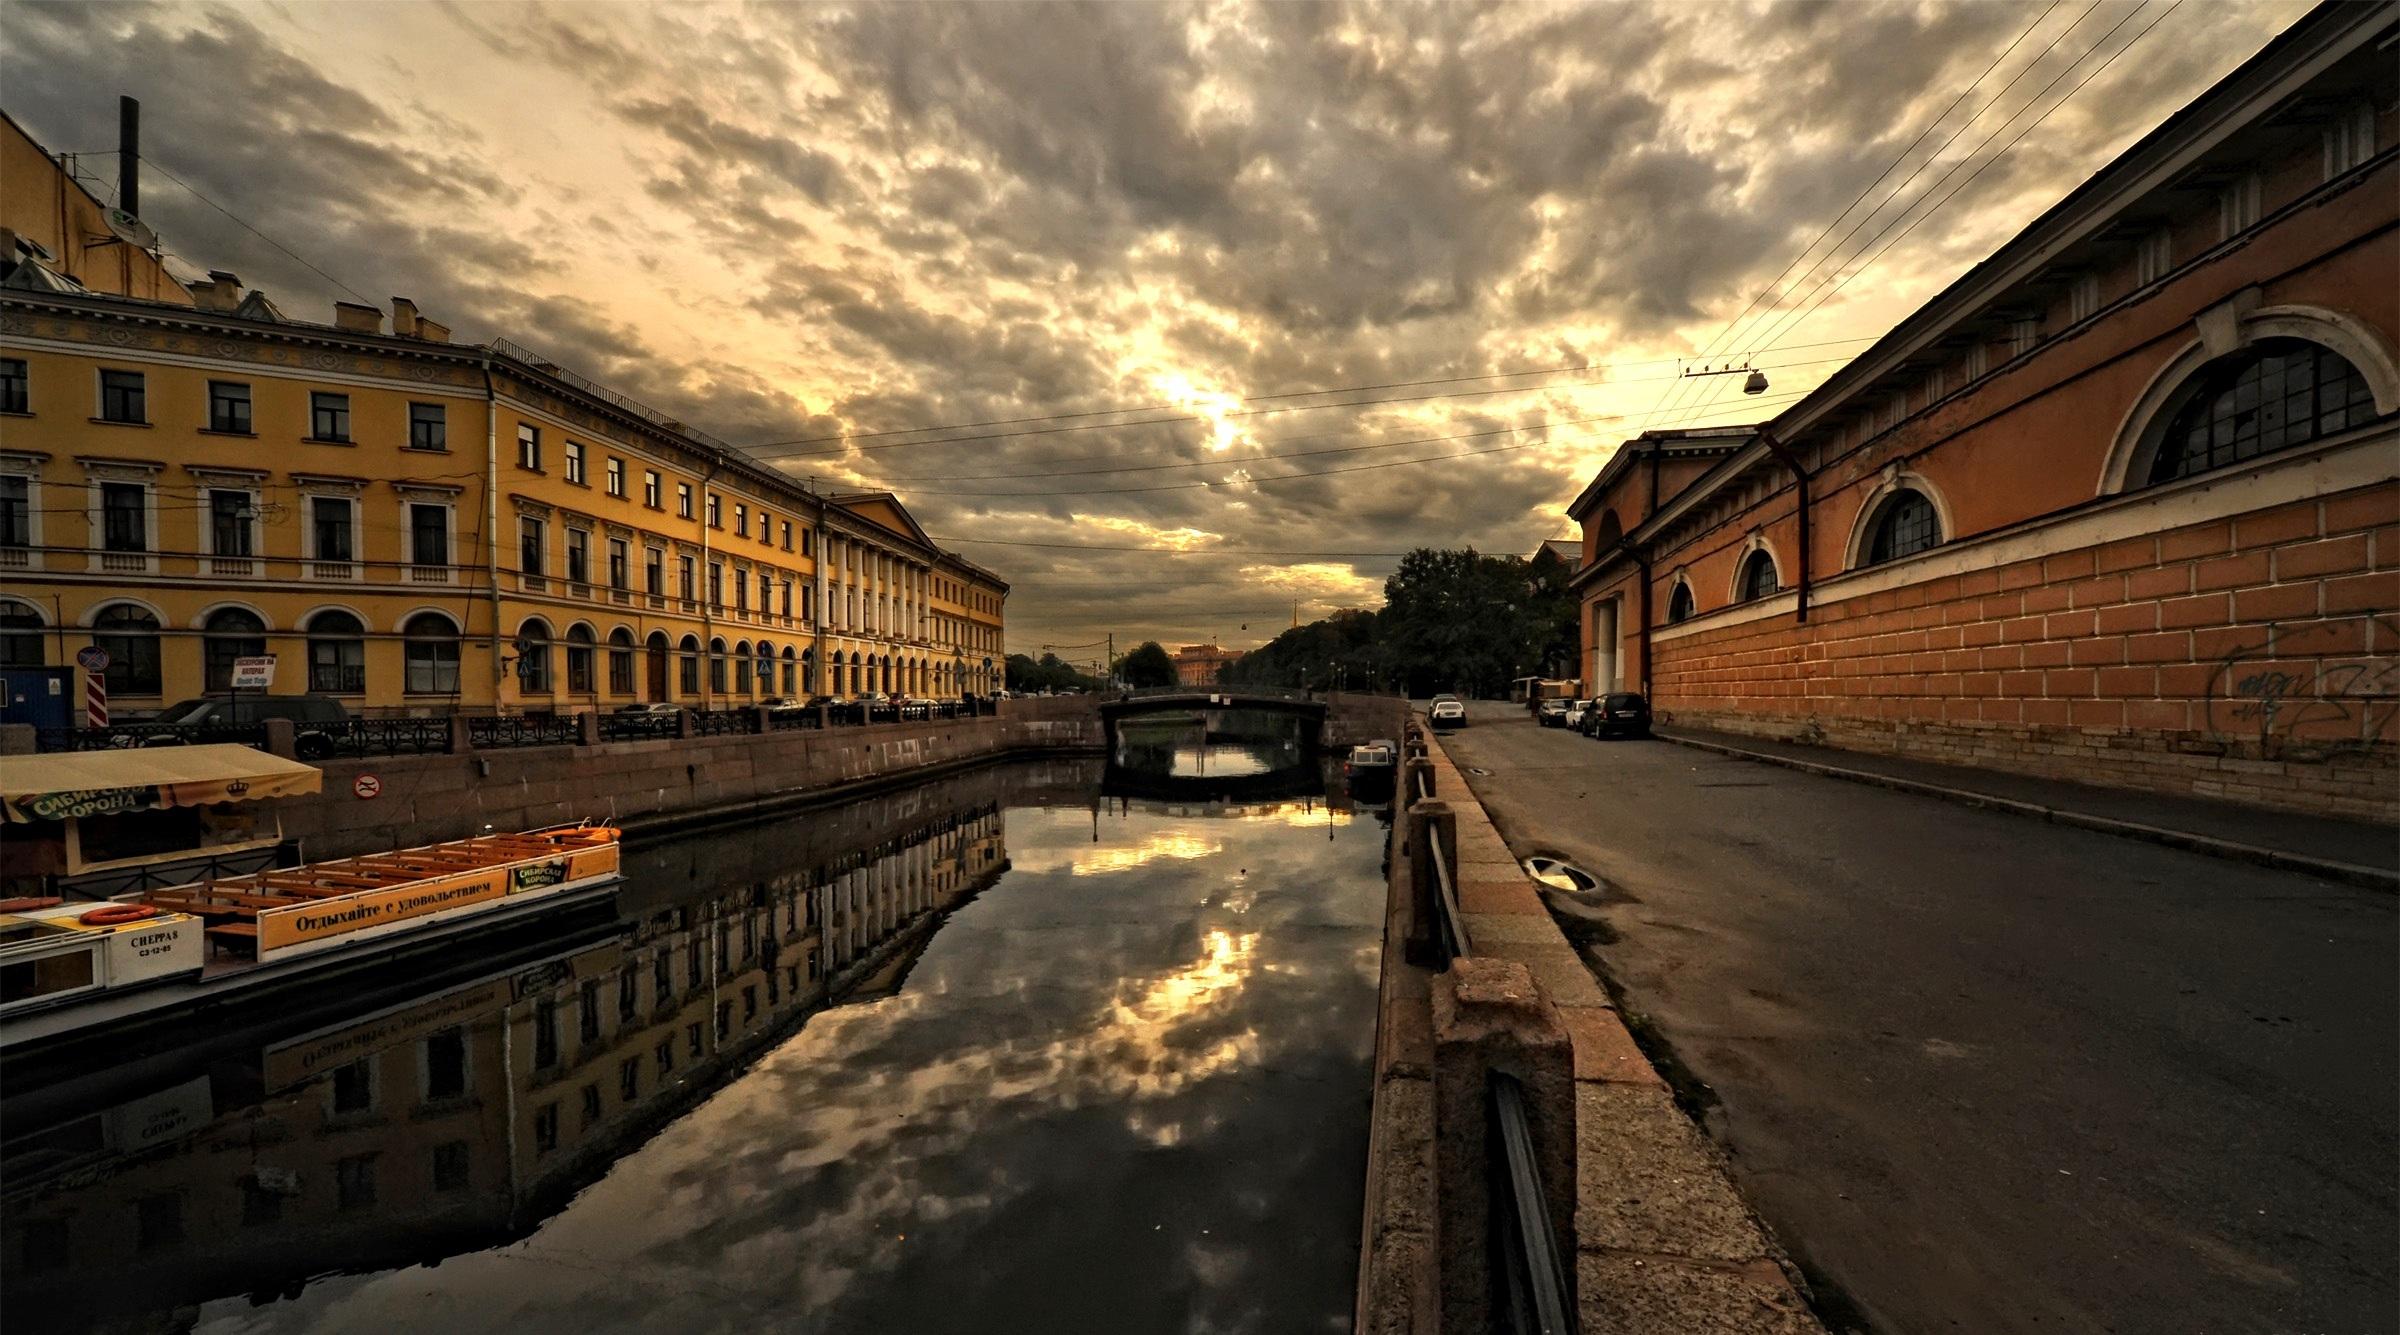 страны архитектура россия Санкт-Петербург без смс